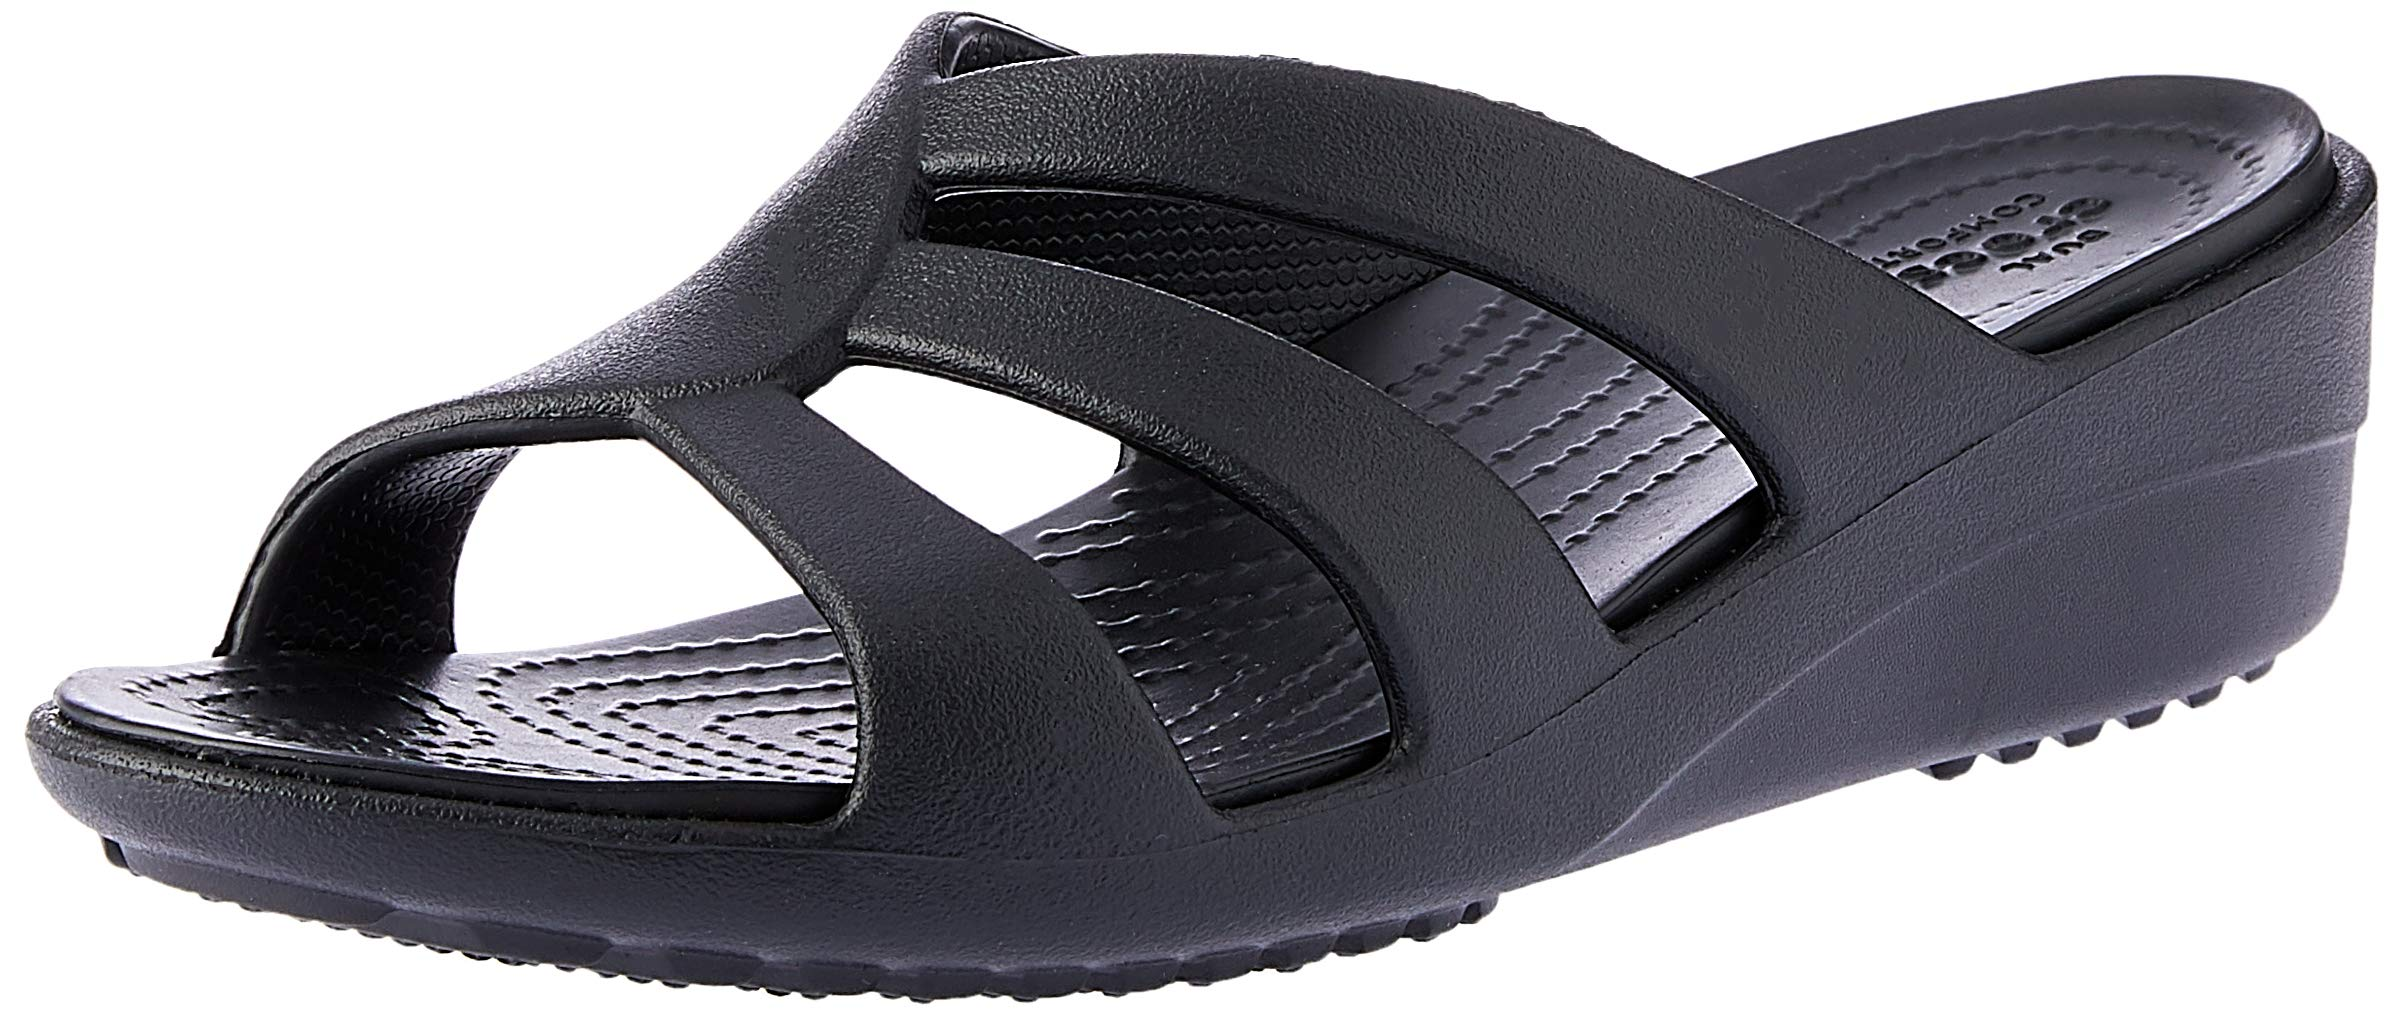 crocs Women's Sanrah Strappy Wedge Sandal, Black, 8 M US by Crocs